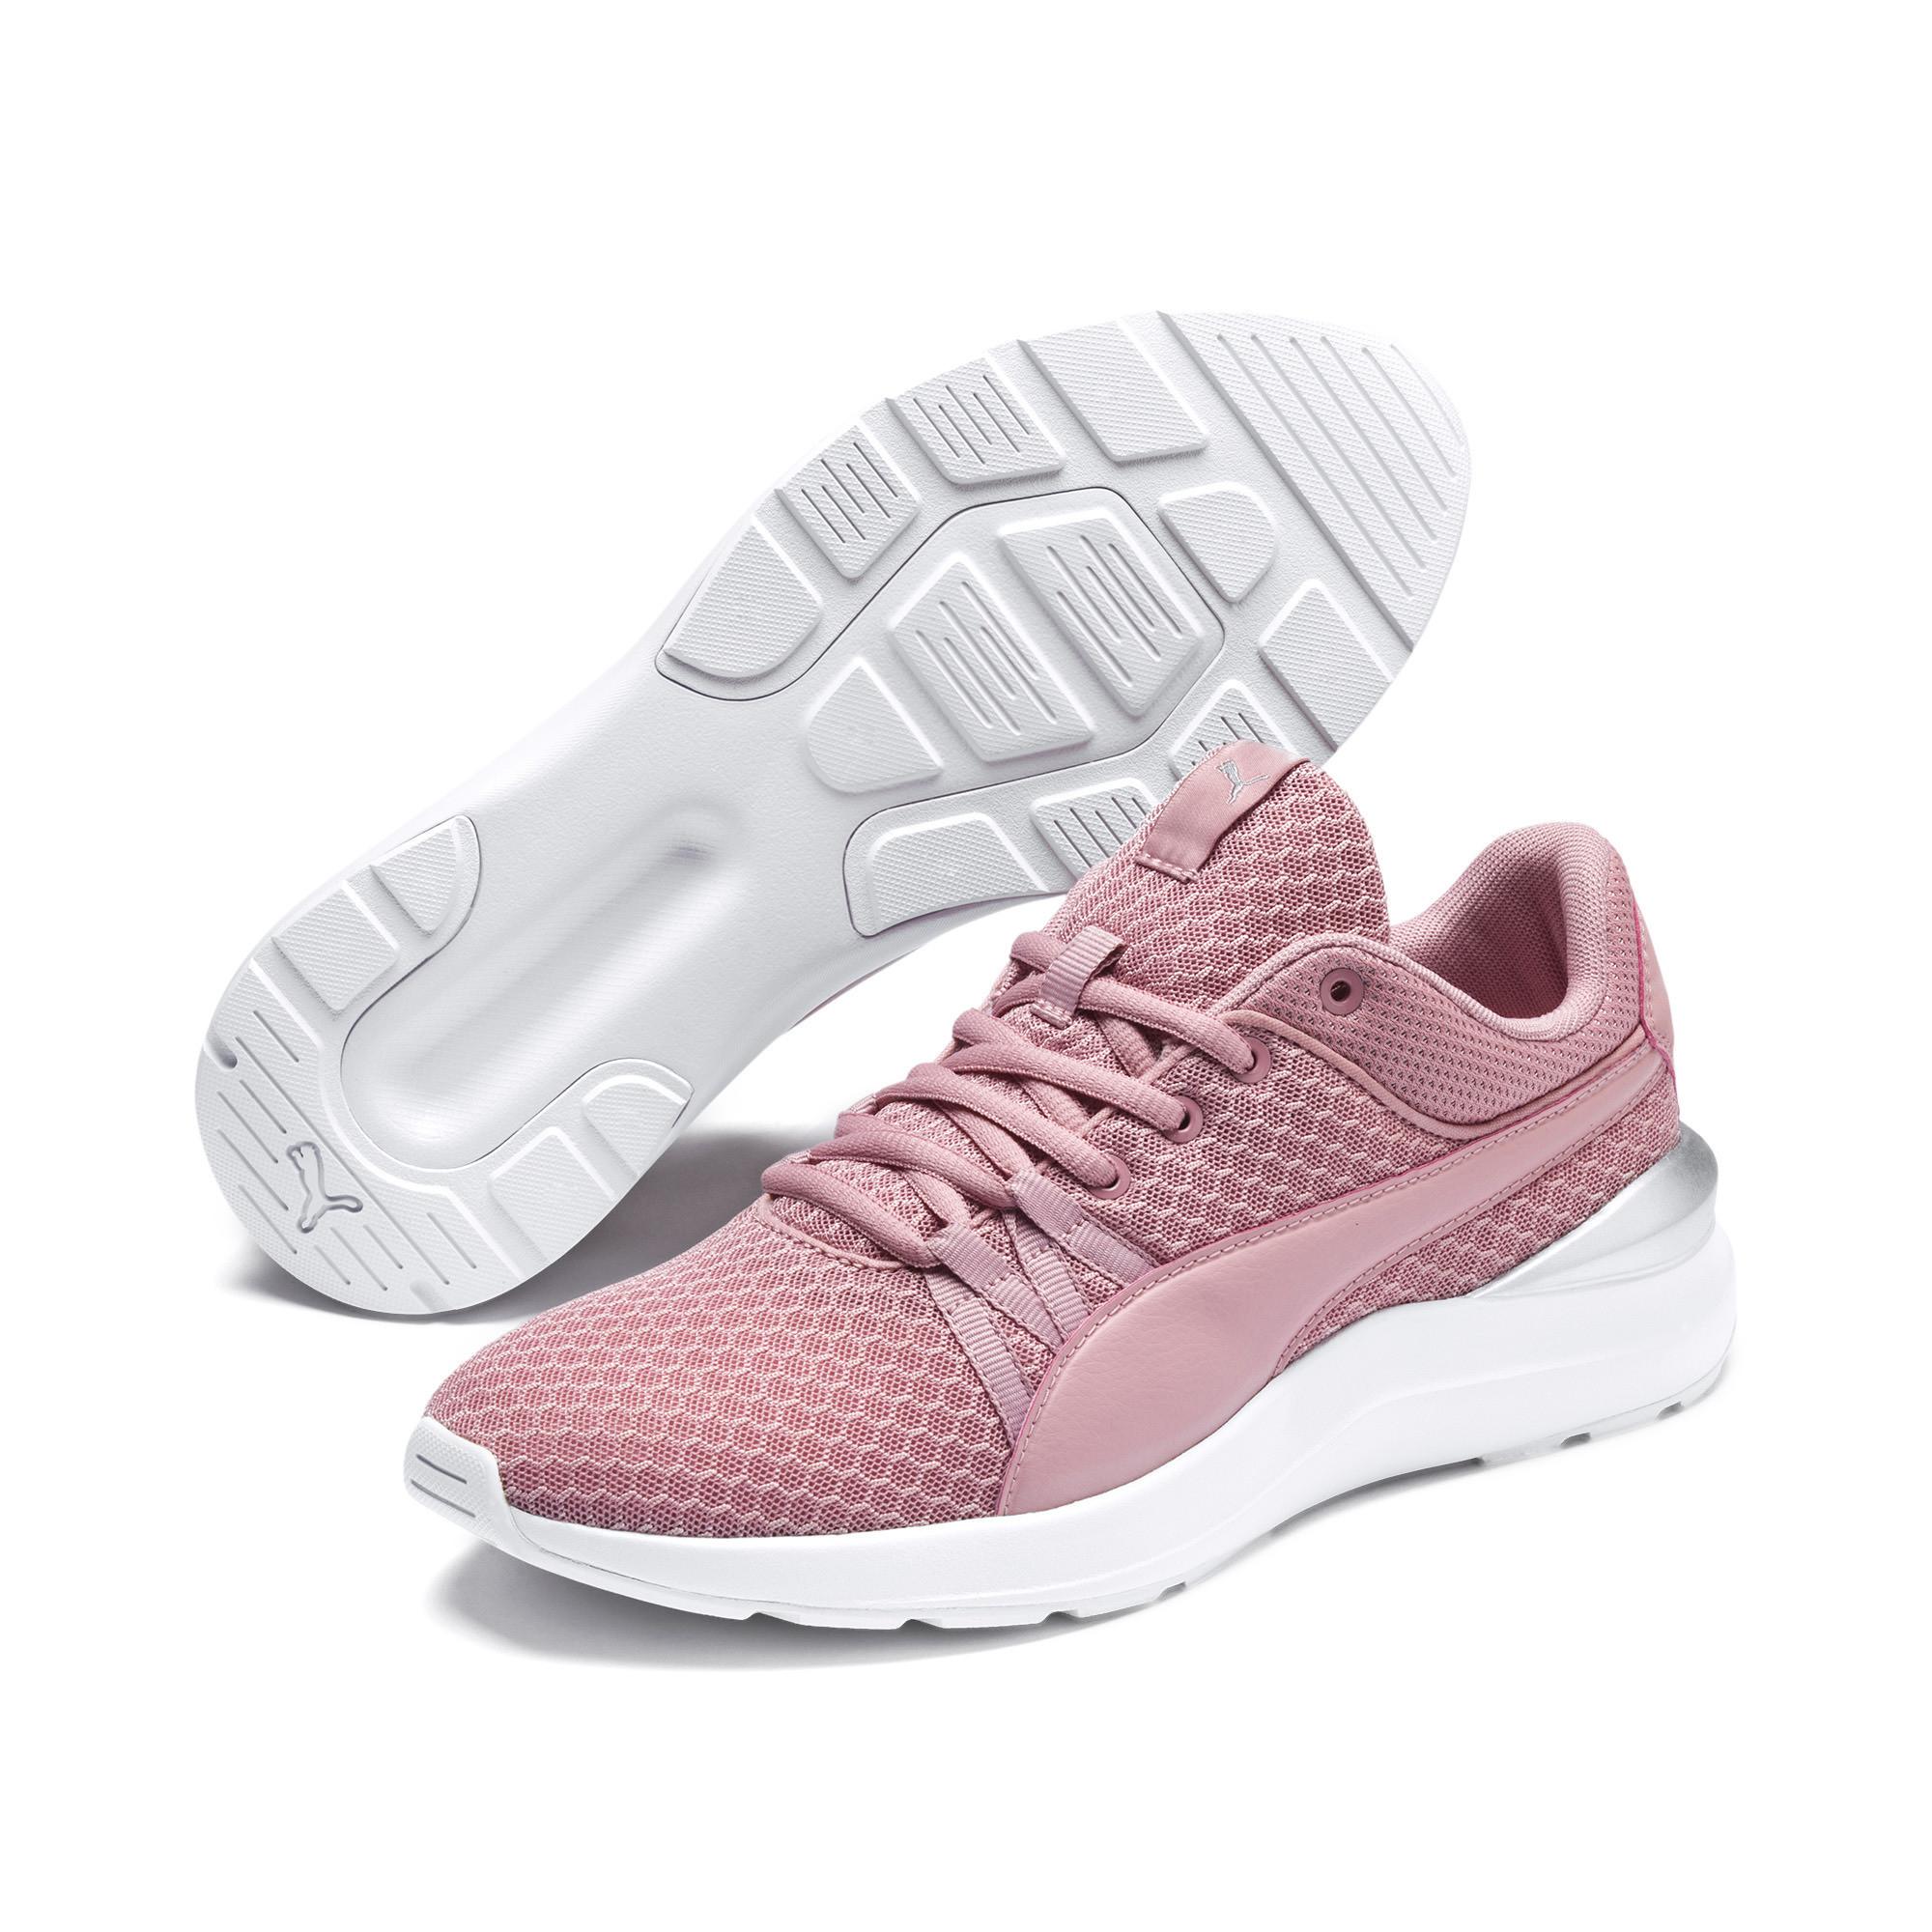 Details about PUMA Cilia Women's Sneakers Women Shoe Basics